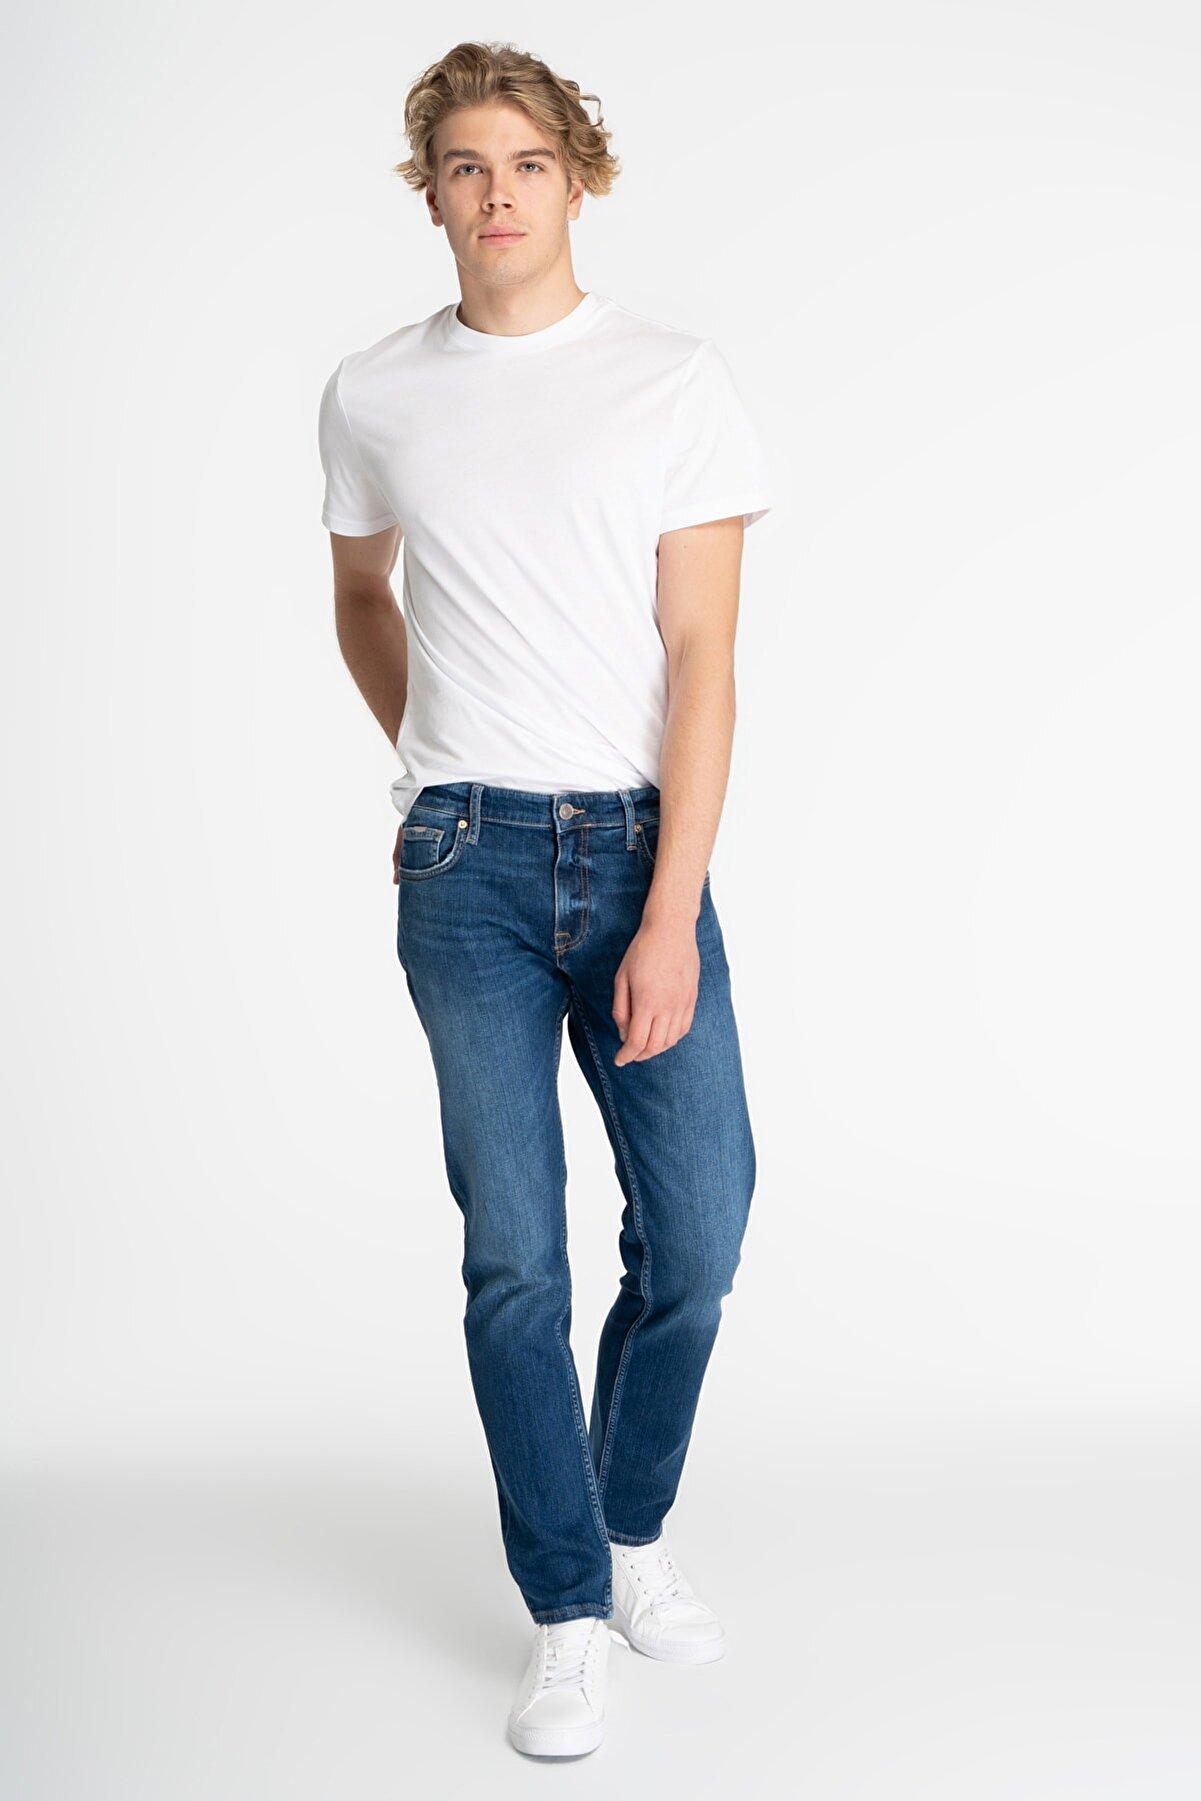 CROSS JEANS Matthew Orta Mavi Slim Straight 0normal Bel Jean Pantolon E 125-006